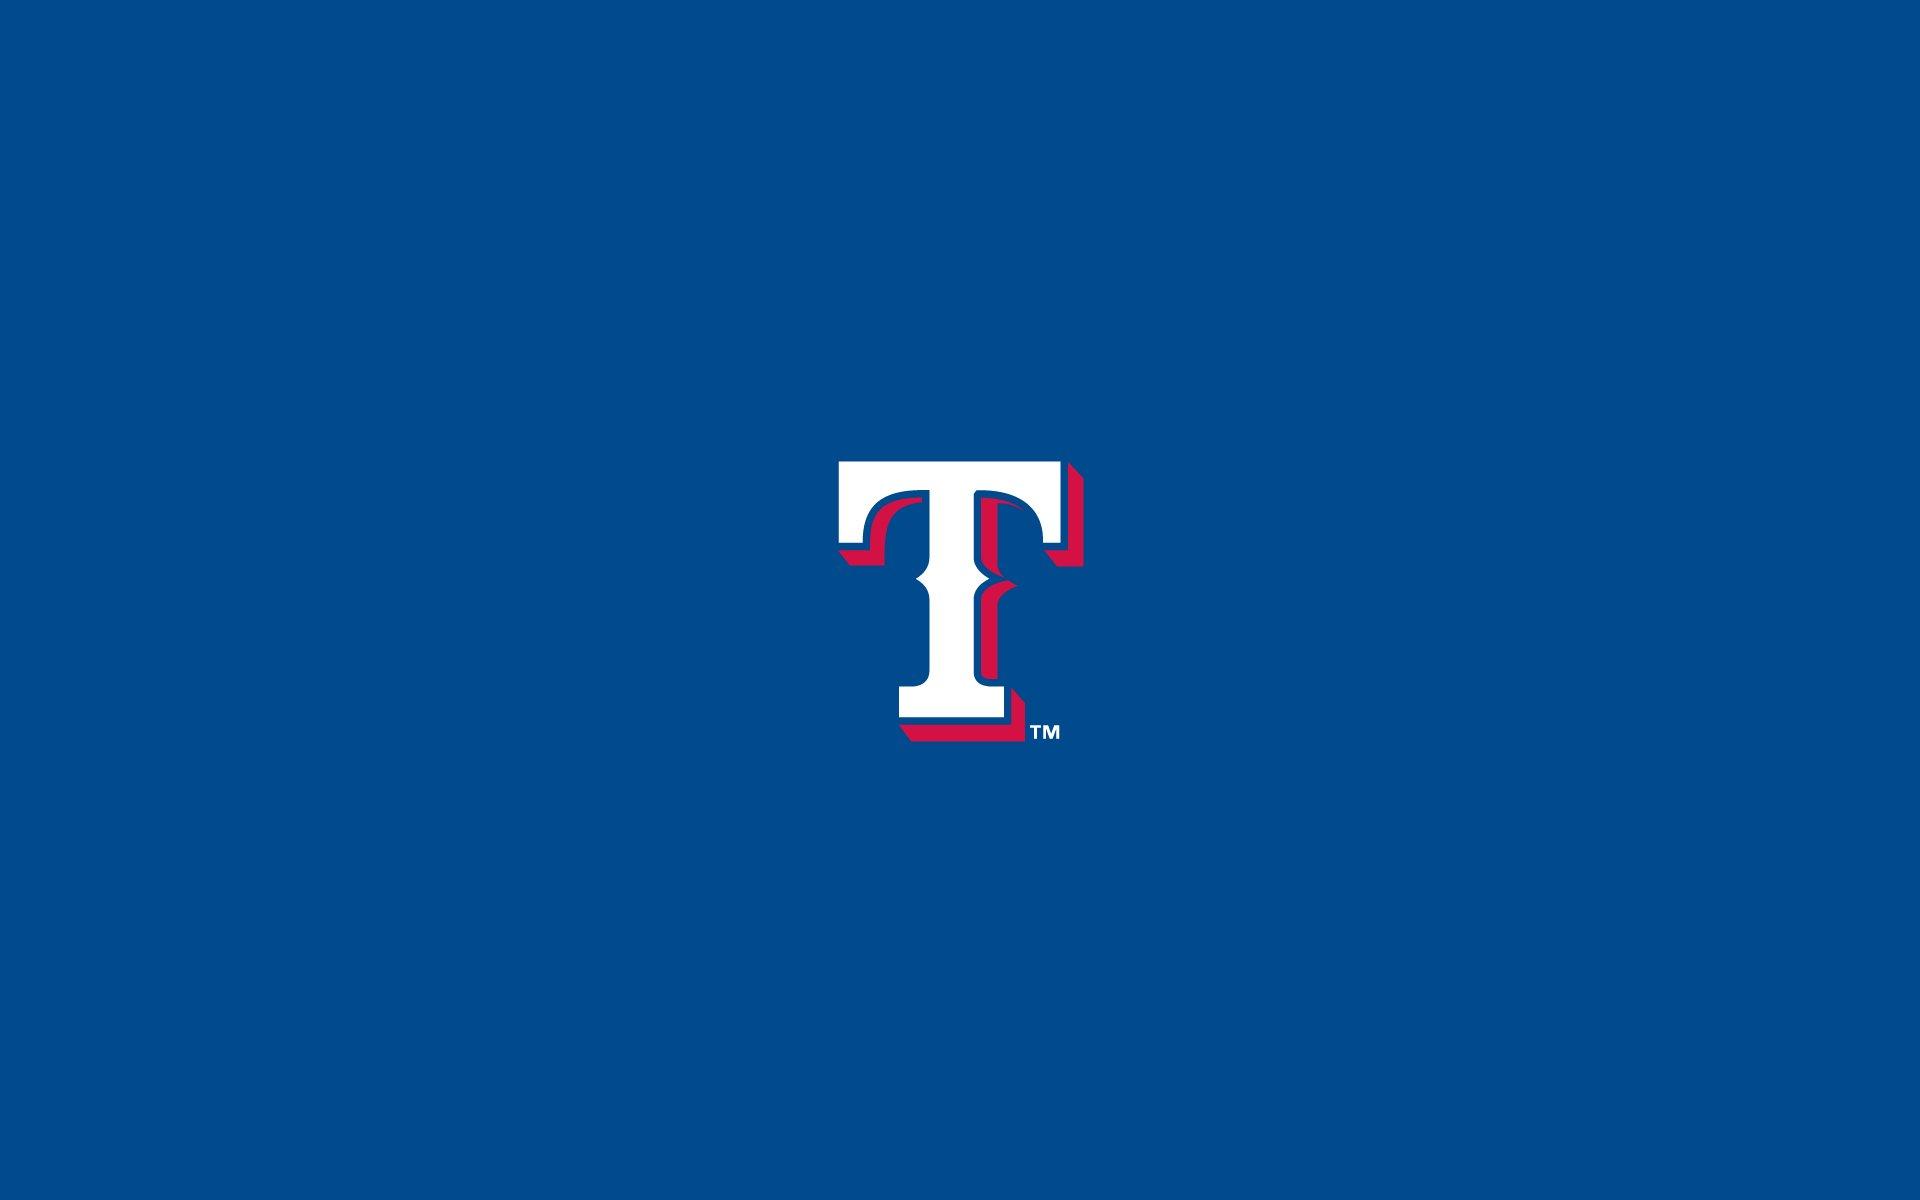 TEXAS RANGERS baseball mlb 51 wallpaper 1920x1200 319027 1920x1200